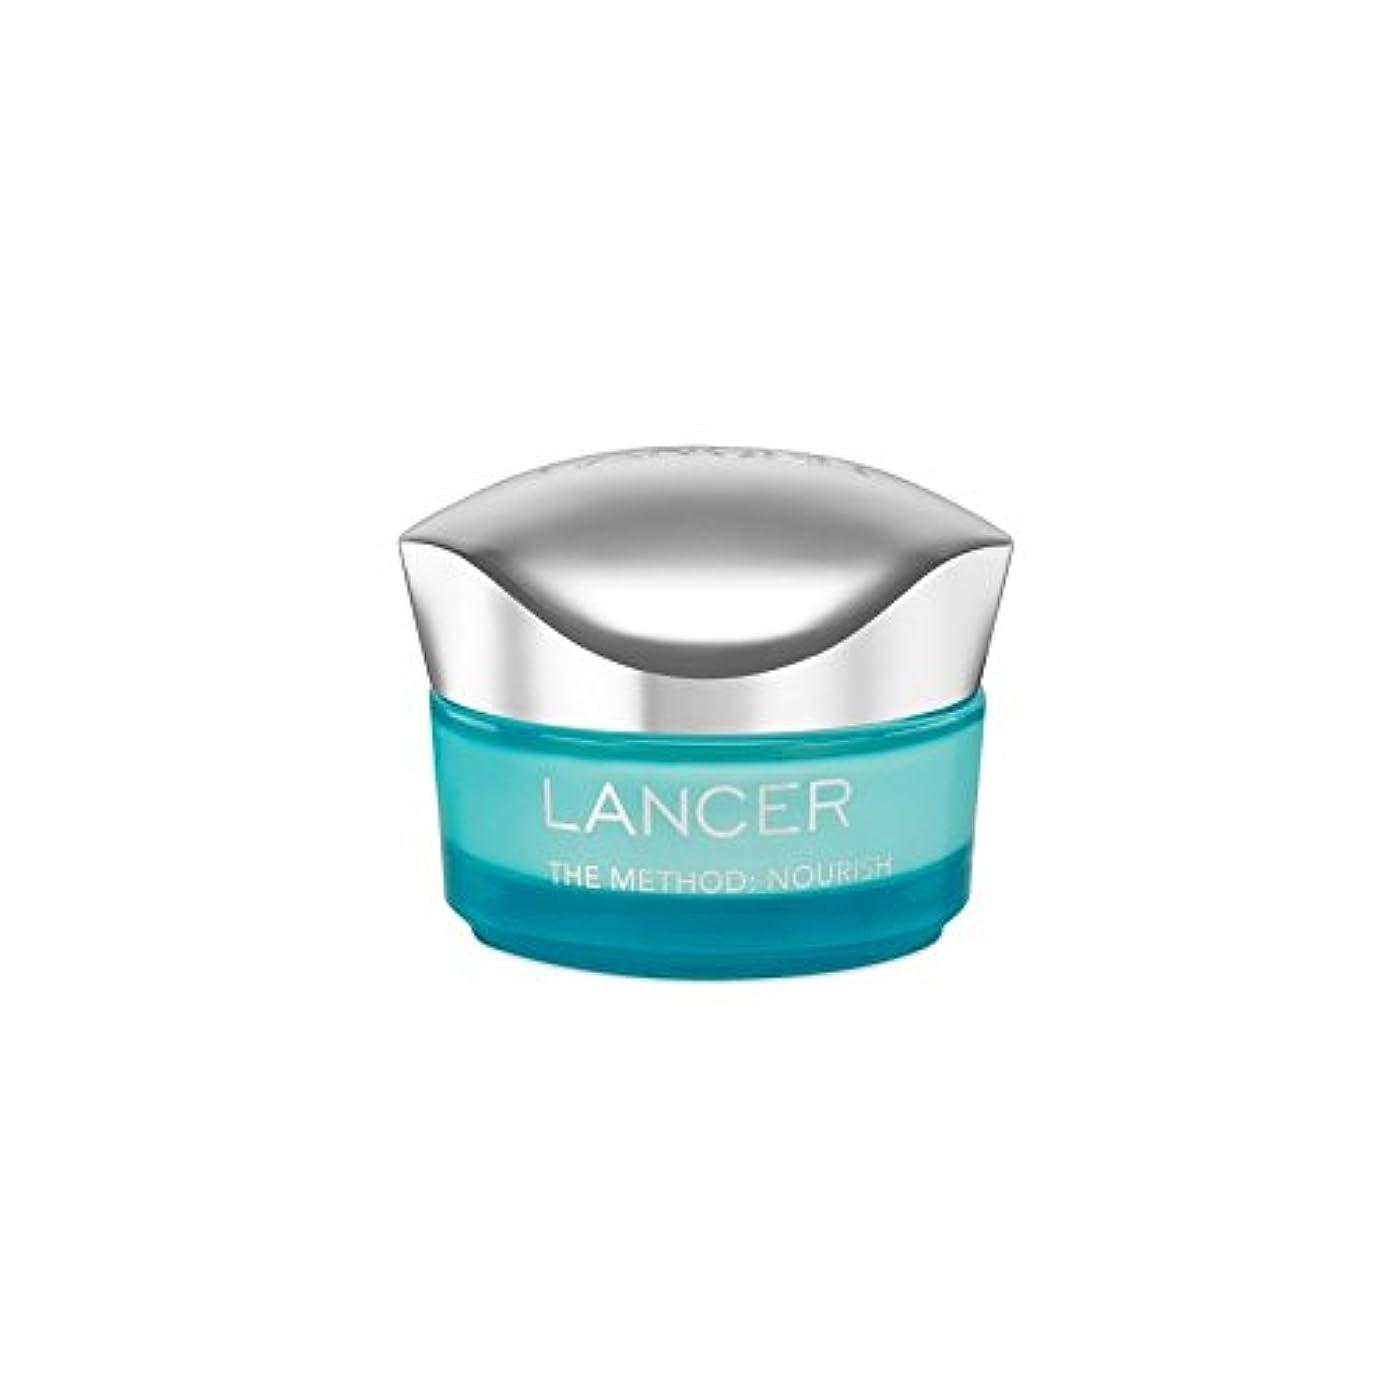 Lancer Skincare The Method: Nourish Moisturiser (50ml) (Pack of 6) - ランサーは、この方法をスキンケア:モイスチャライザー(50)に栄養を与えます x6...